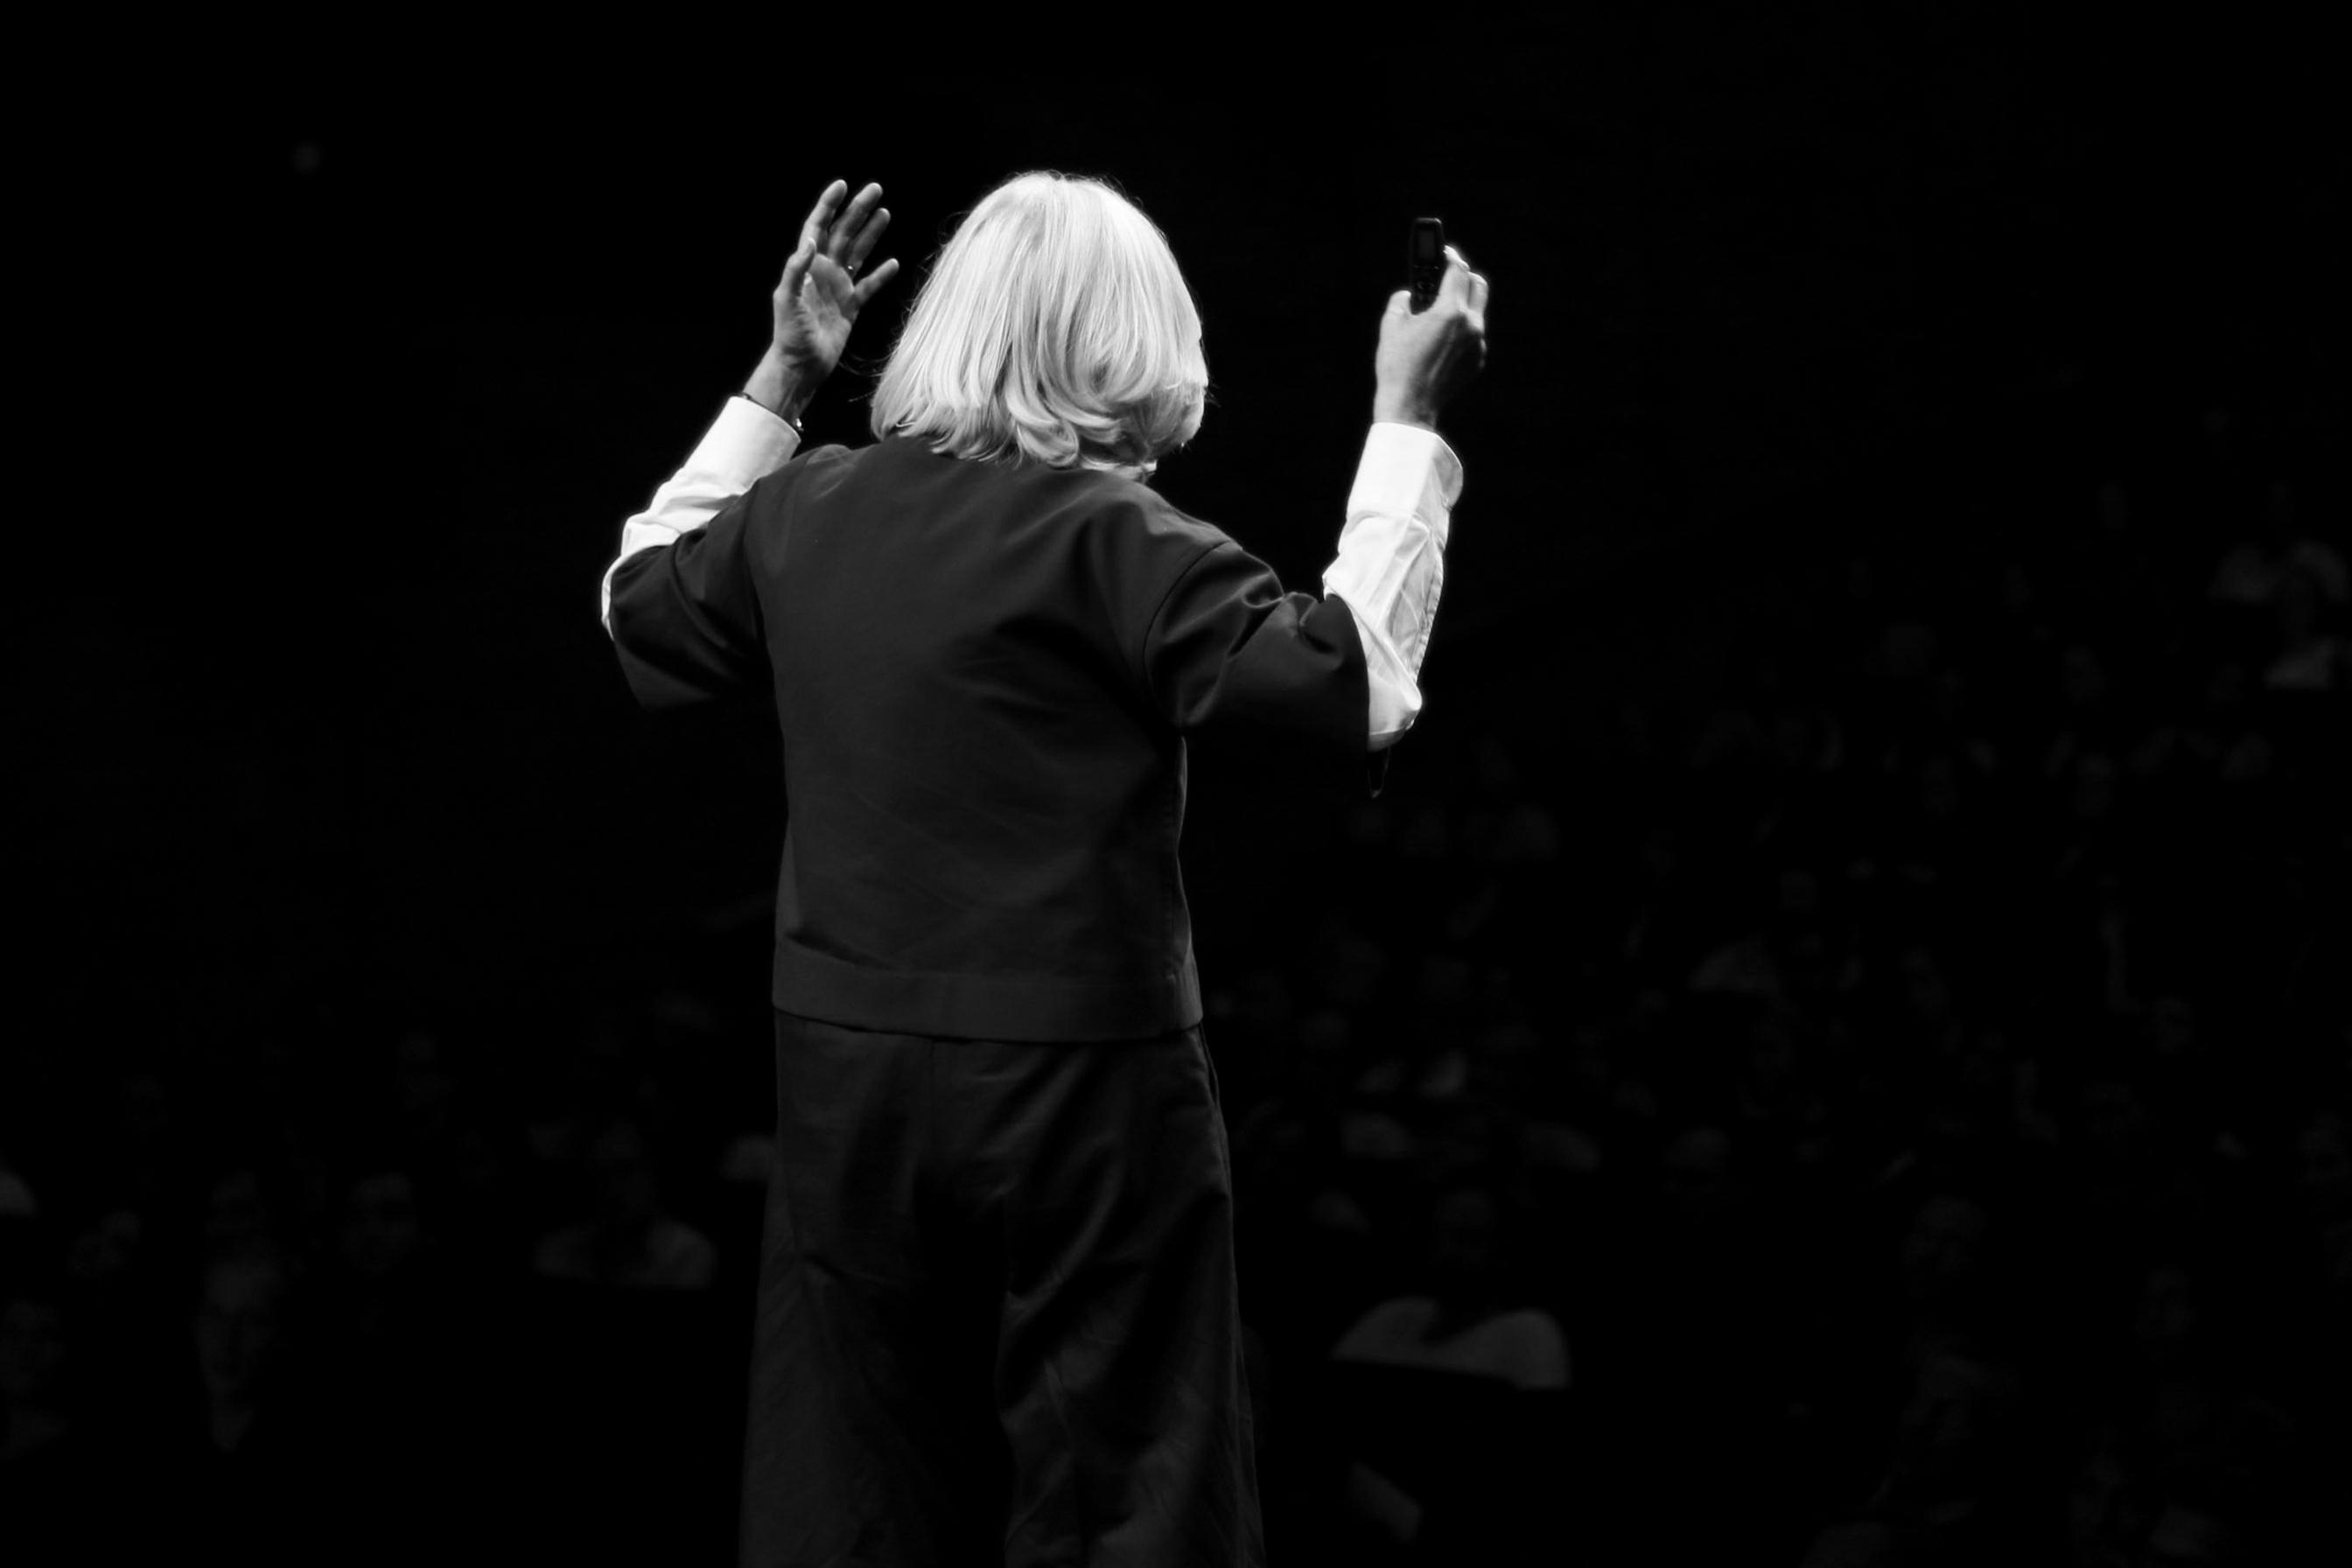 Andrea Gebhard